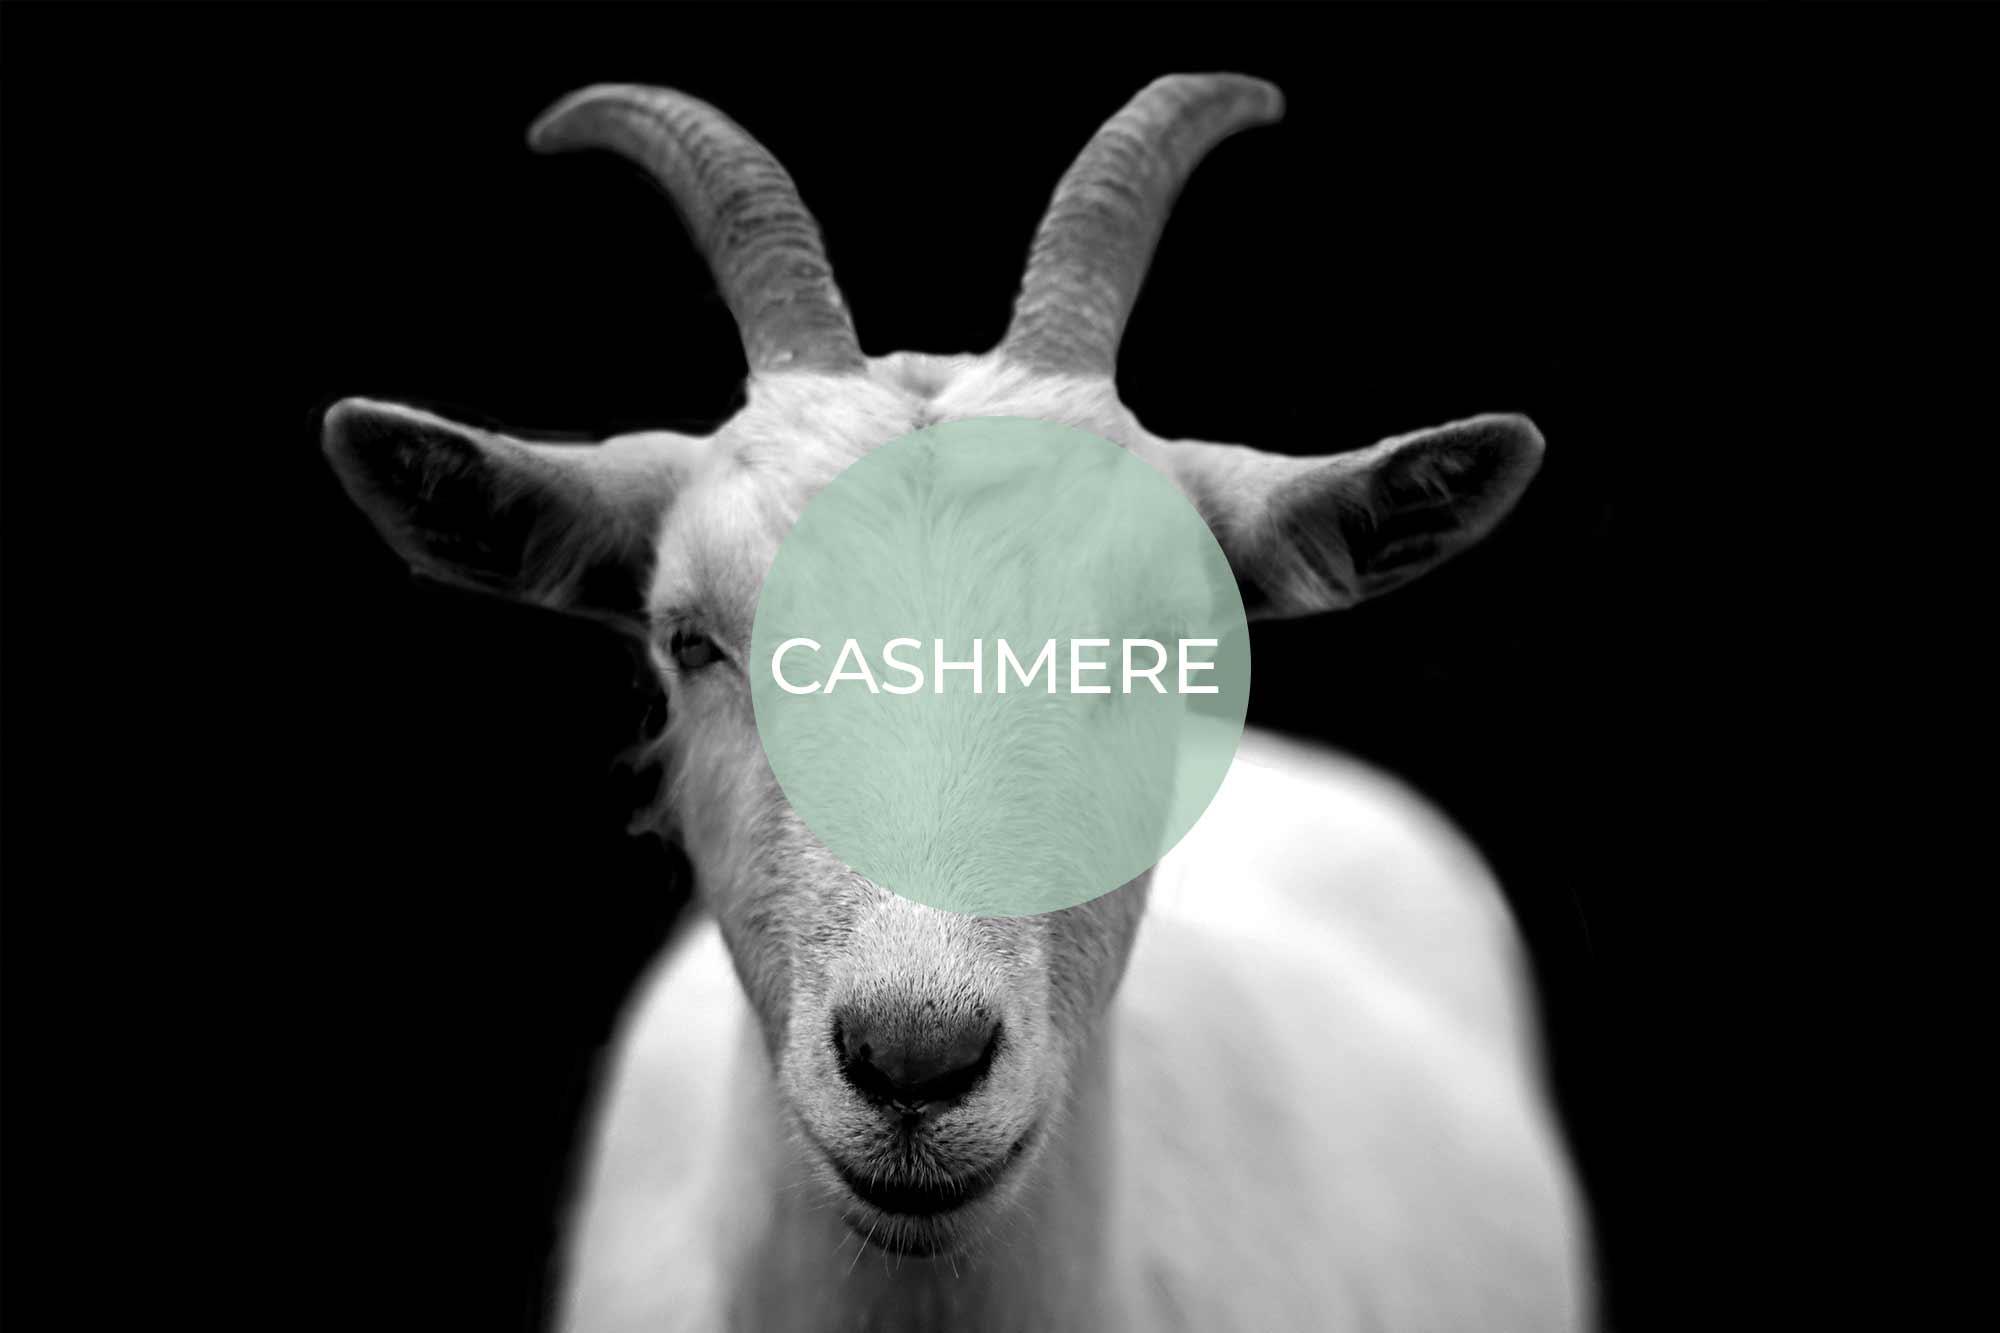 cashmere its vegan made